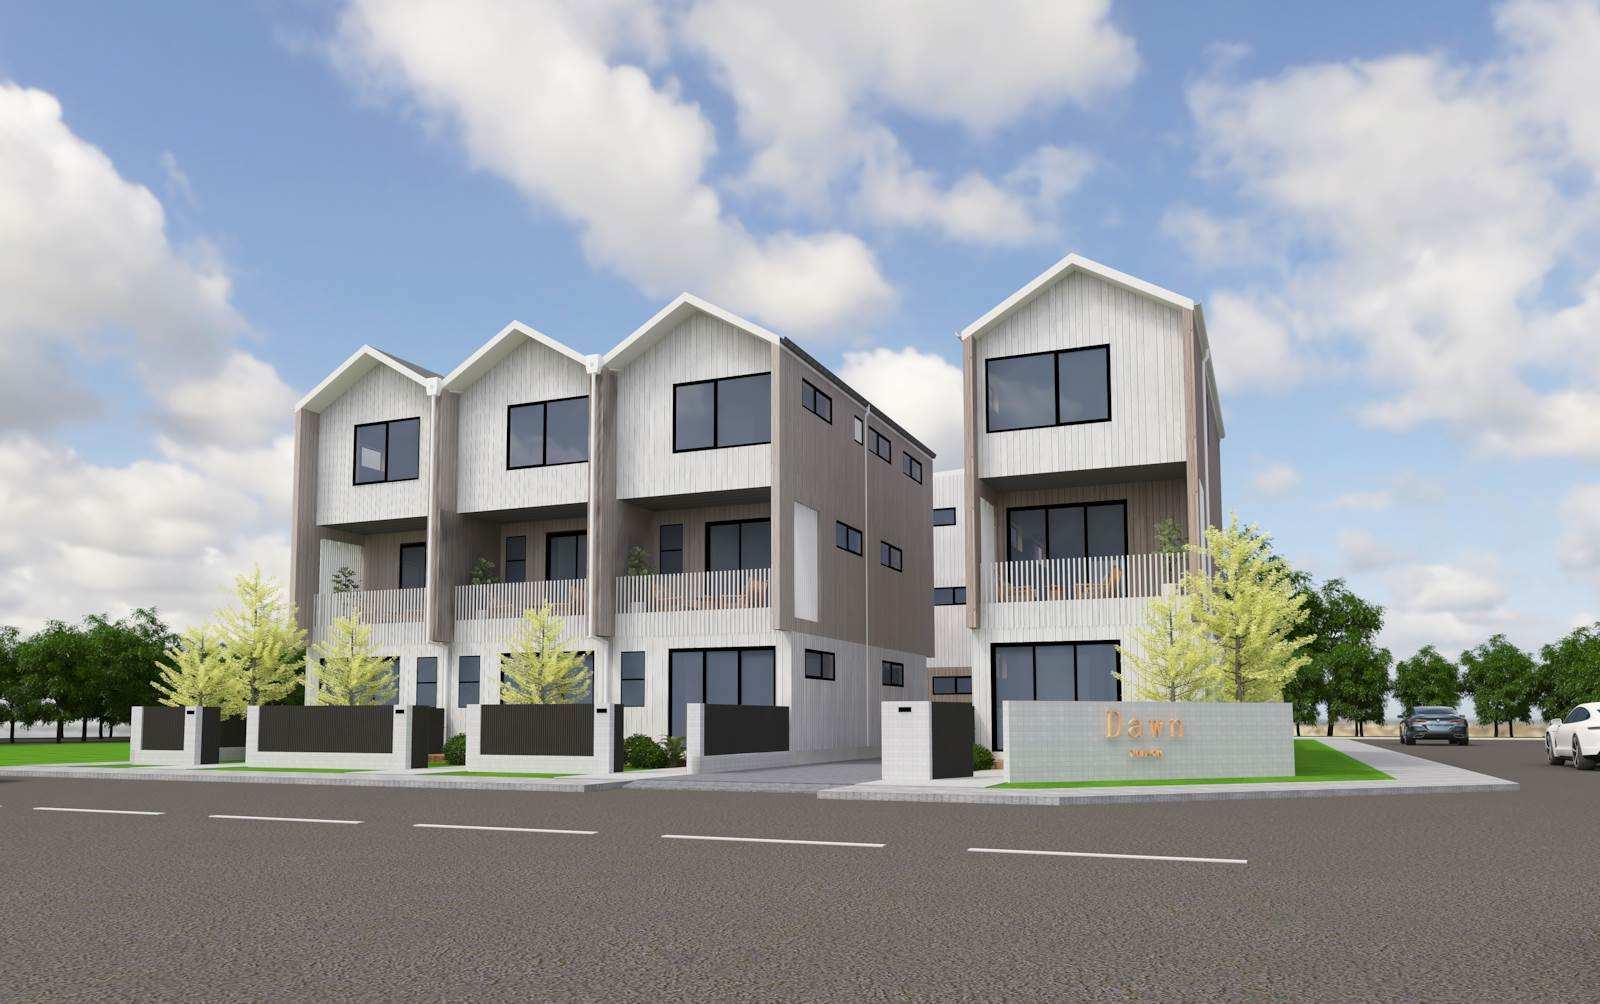 Te Atatu South 3房 9套全新在建美宅 多户型选择 15分钟抵达奥克兰CBD 高端配设 自住&投资必看! Superb Location, Under Construction New Home!